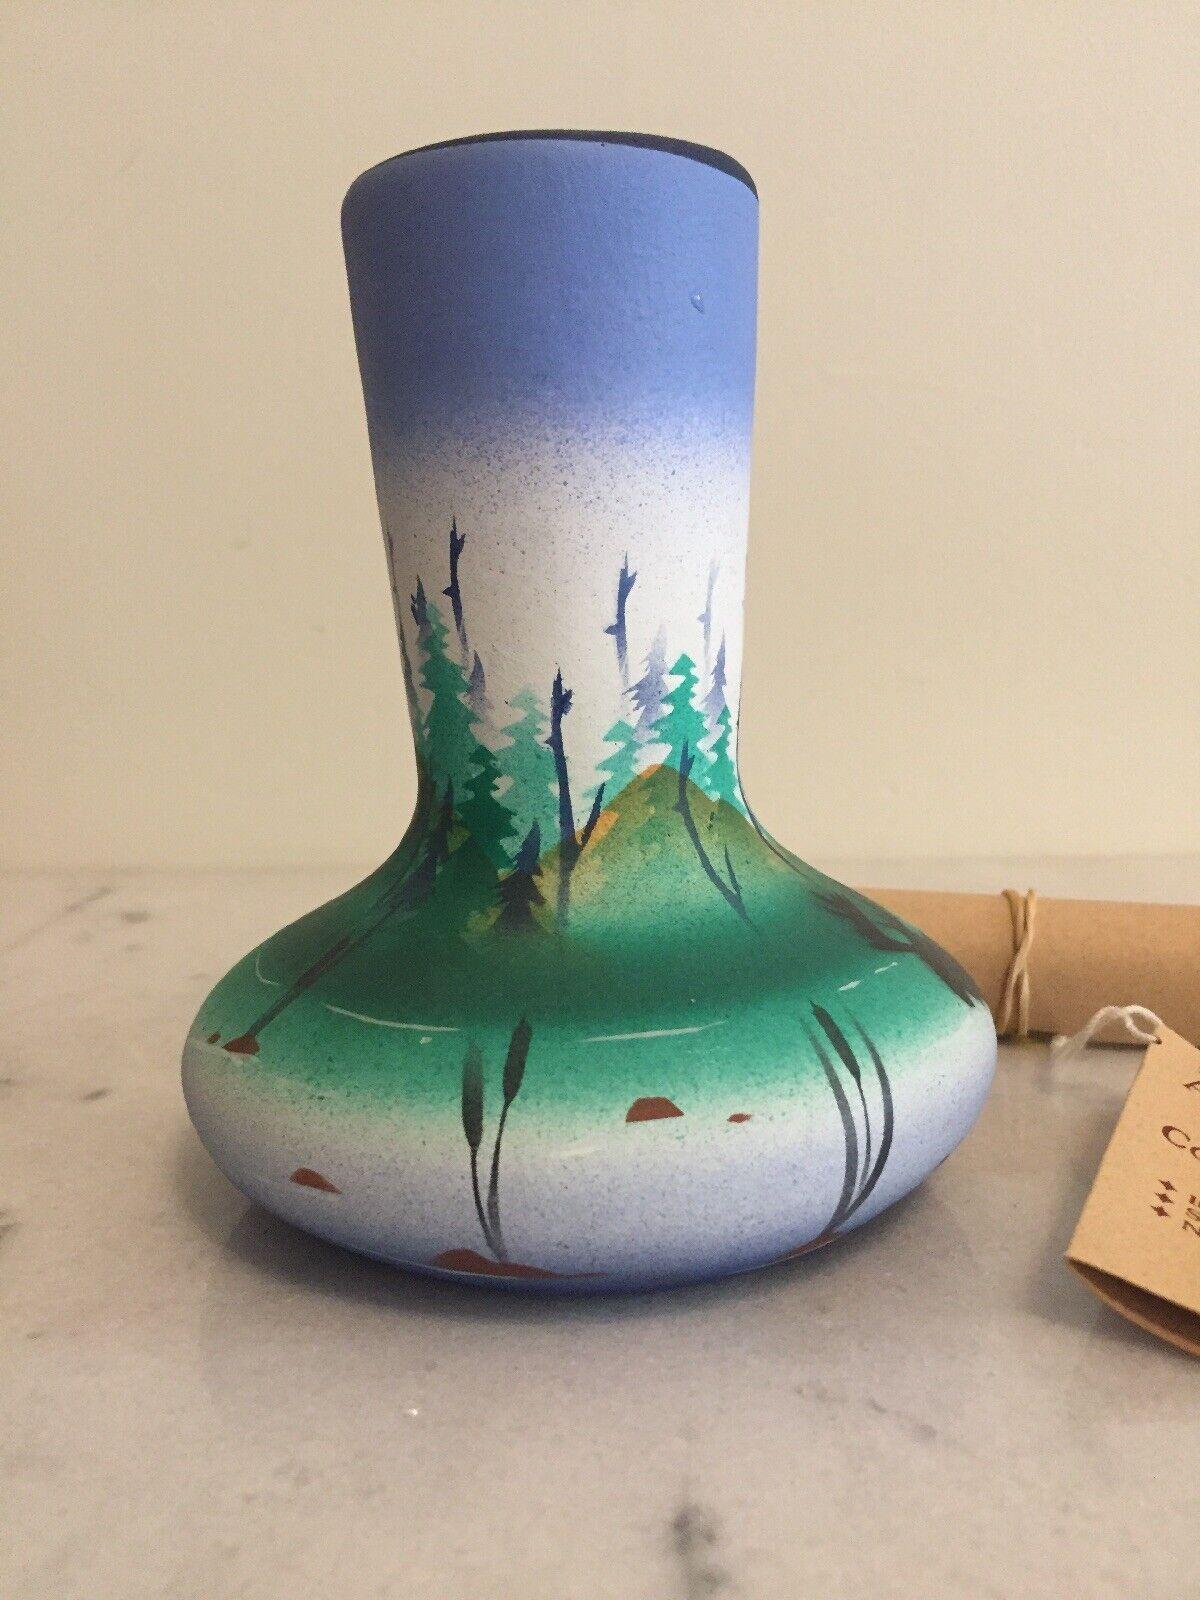 American Art Pottery Vase American Wild Collection R.W. Adamson 5 1/4 Tall - $13.99